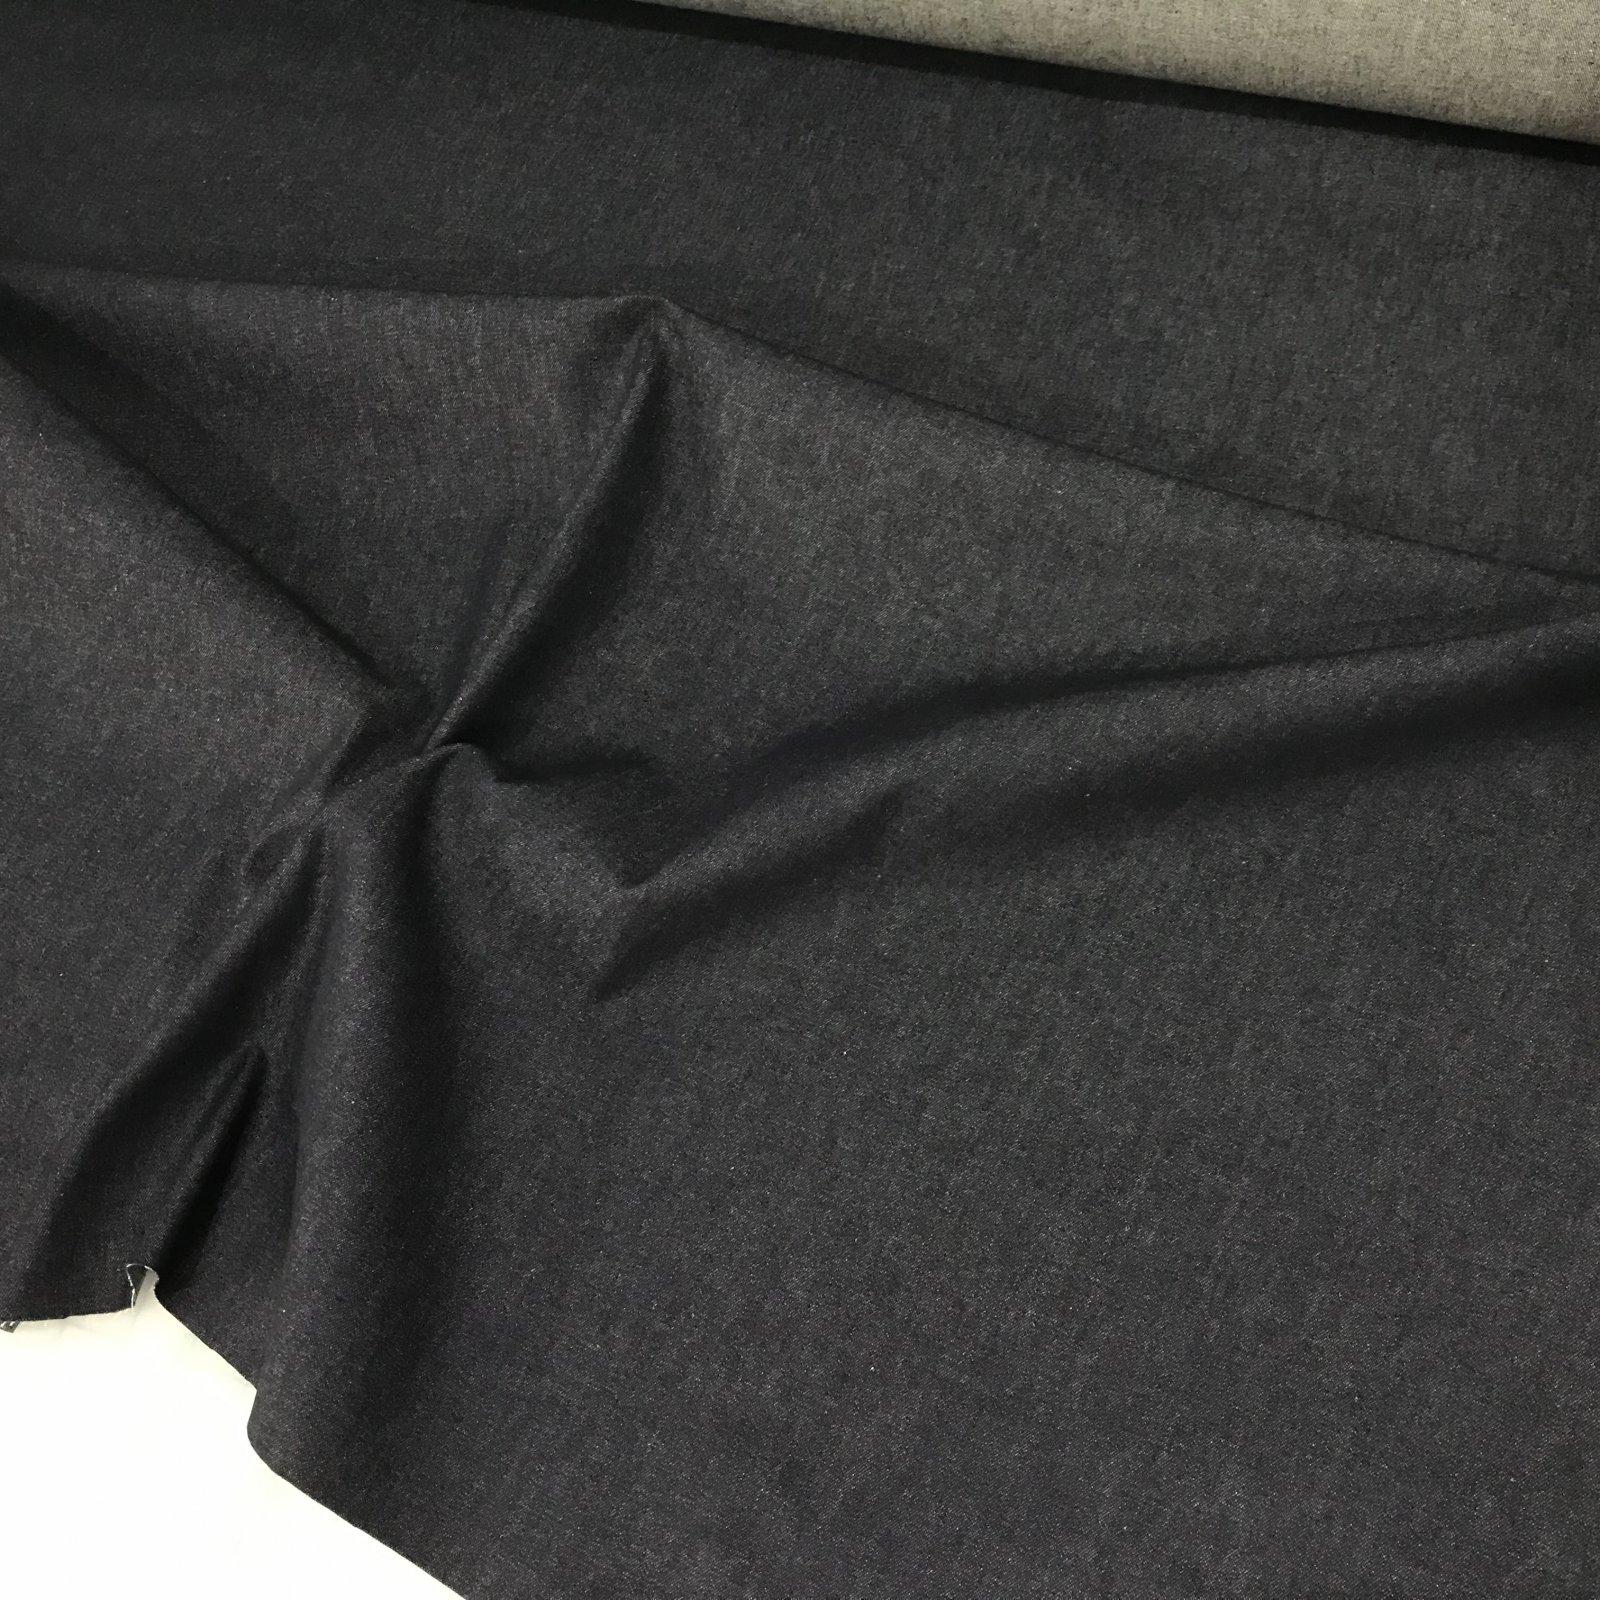 Denim - Cotton Indigo - 8 oz